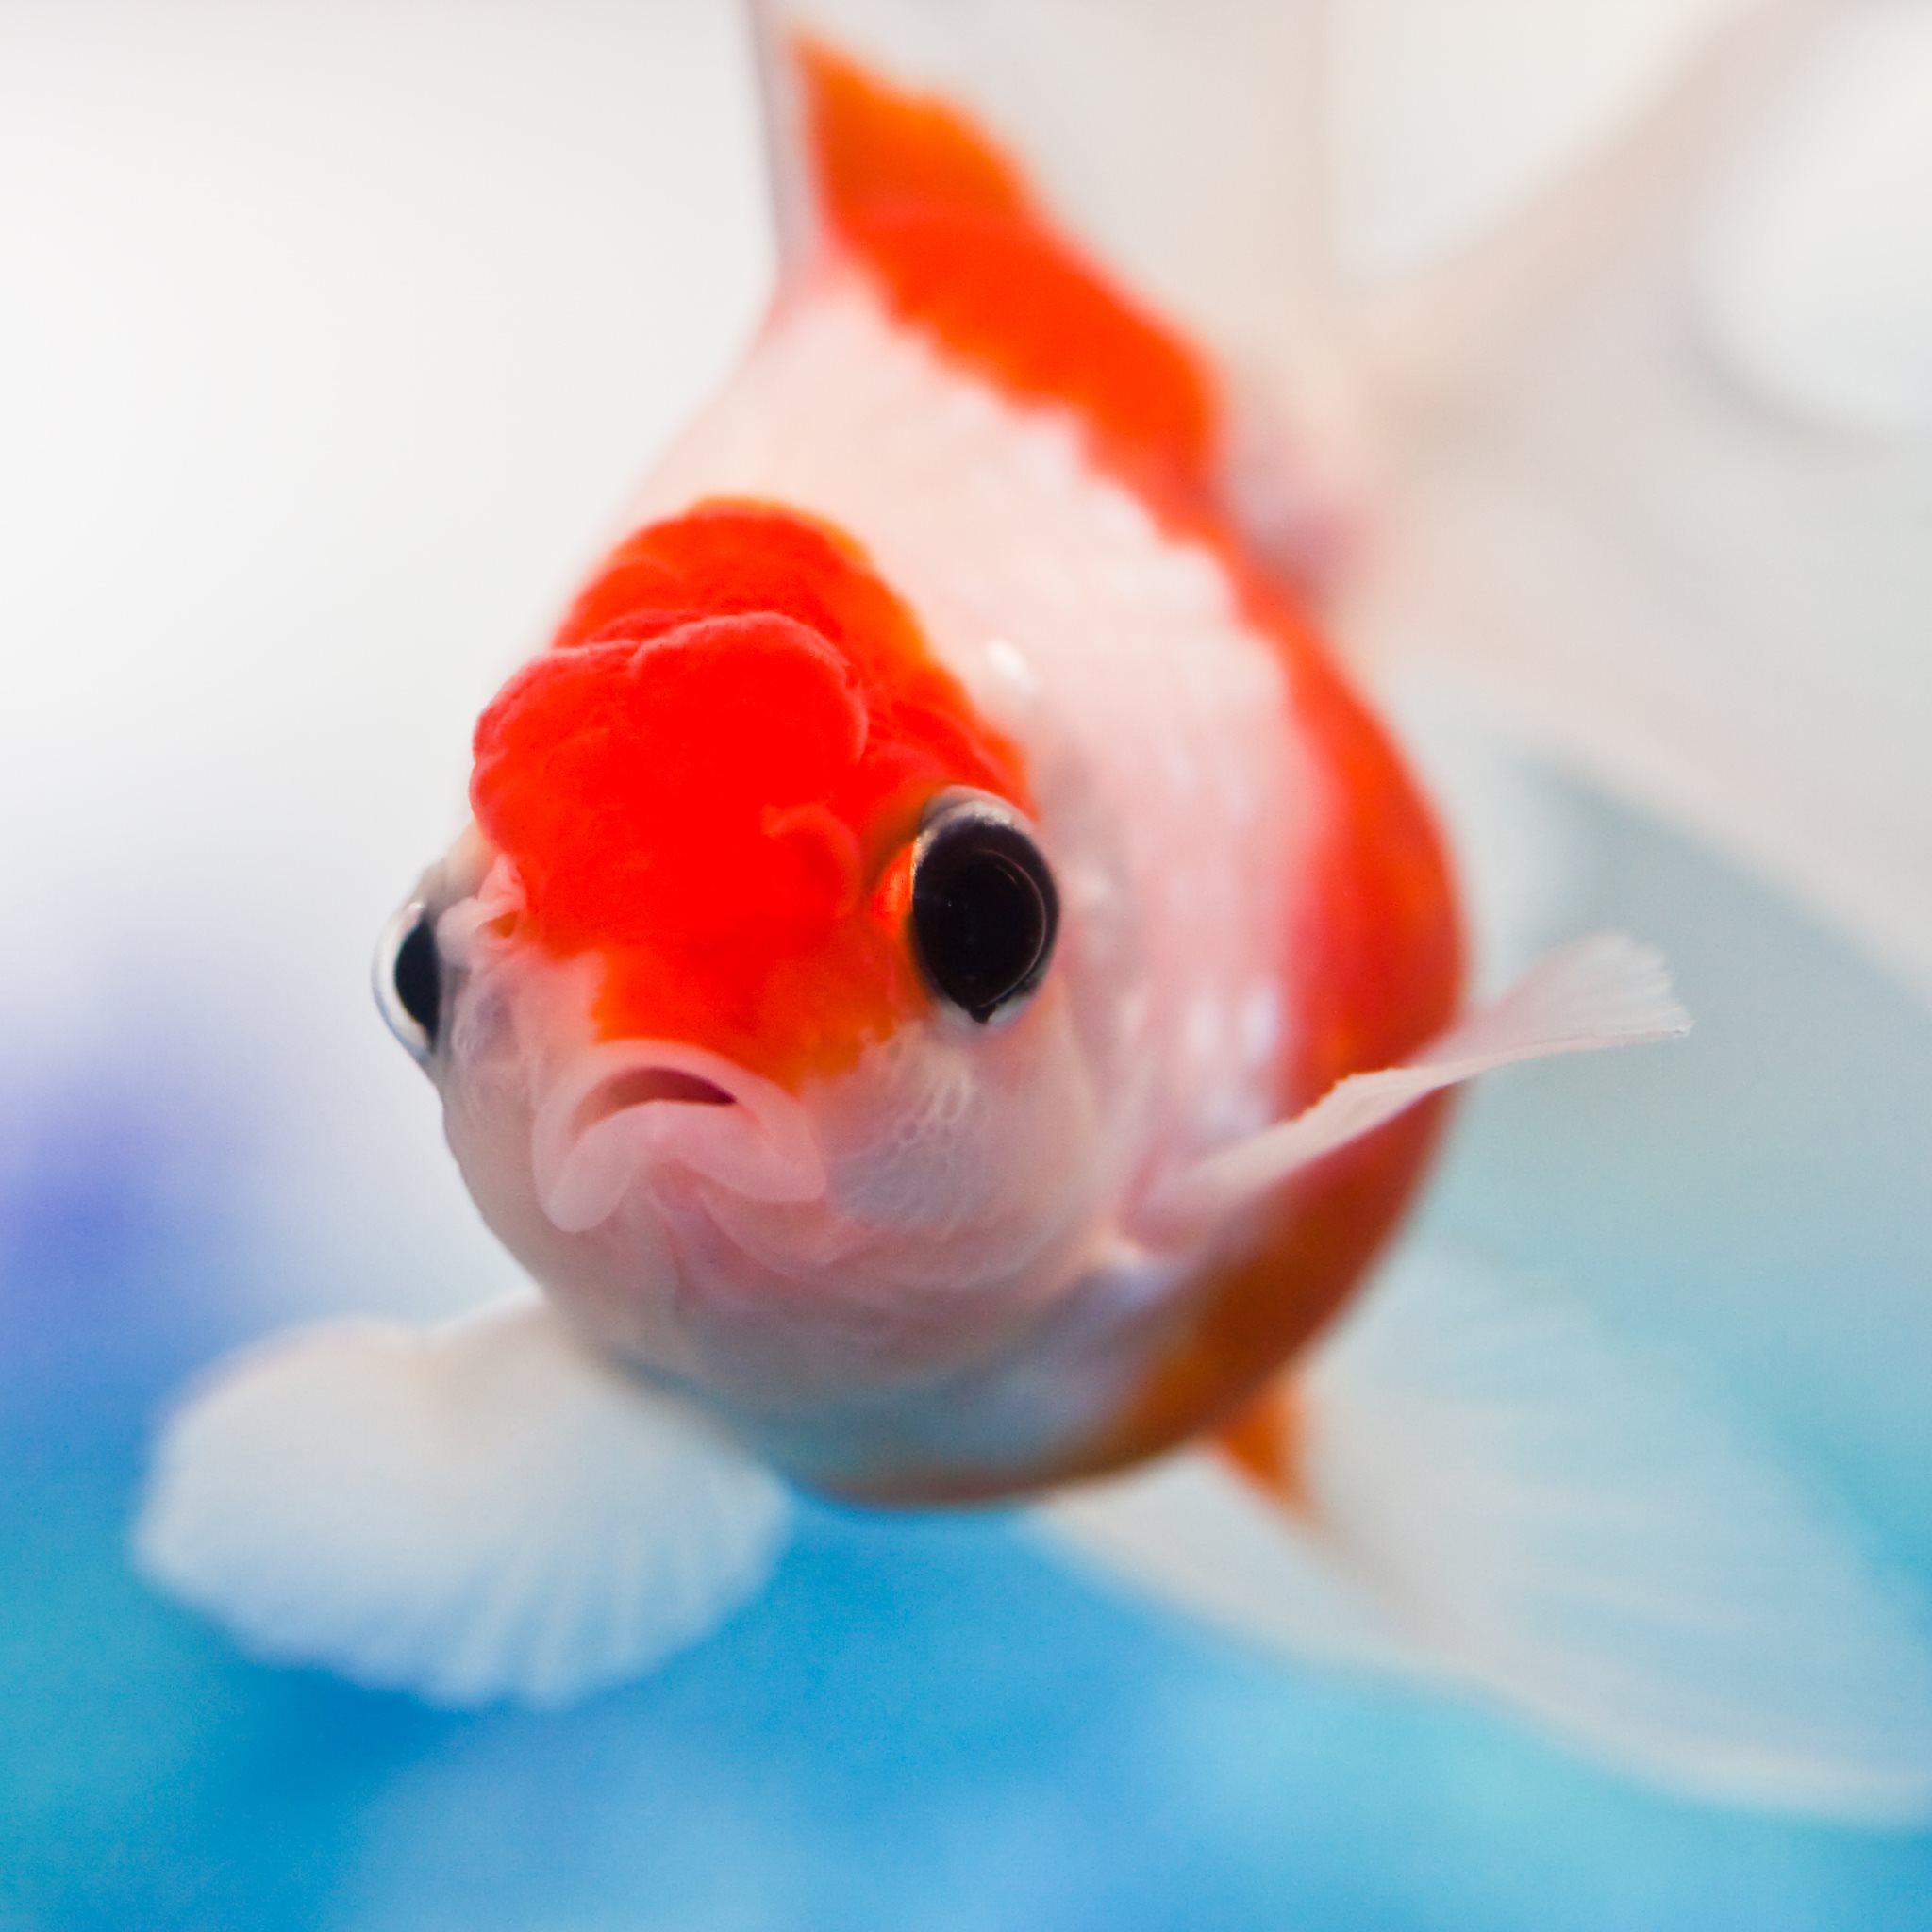 ... Orange Goldfish Goldfish for ipad: 2048x2048 Black And Orange Comet